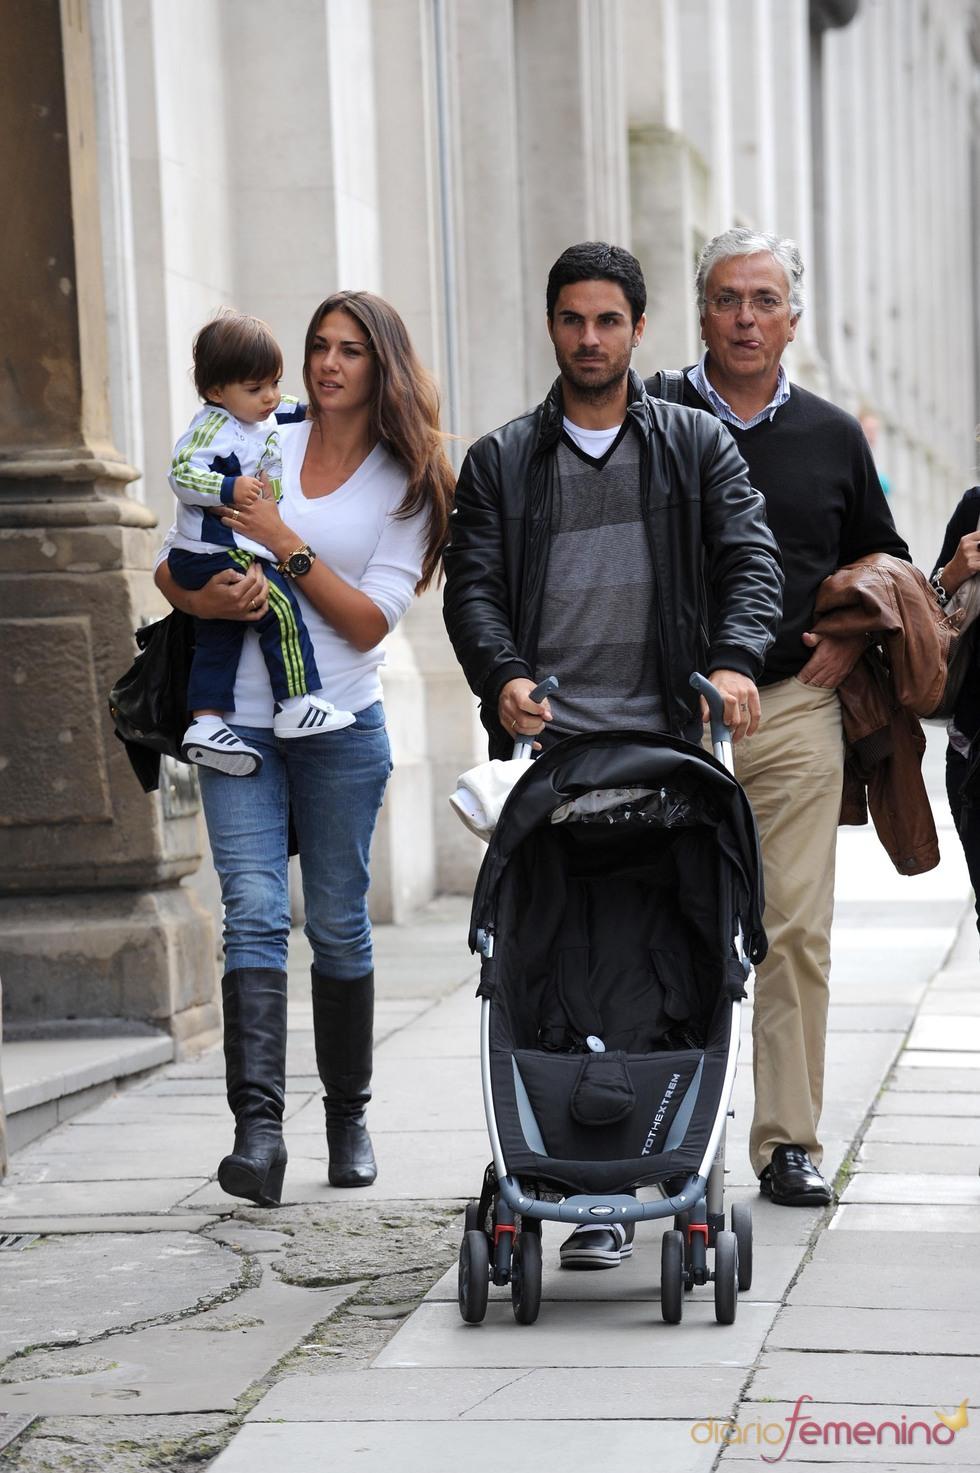 Photo of Mikel Arteta & his  Son  Gabriel Arteta